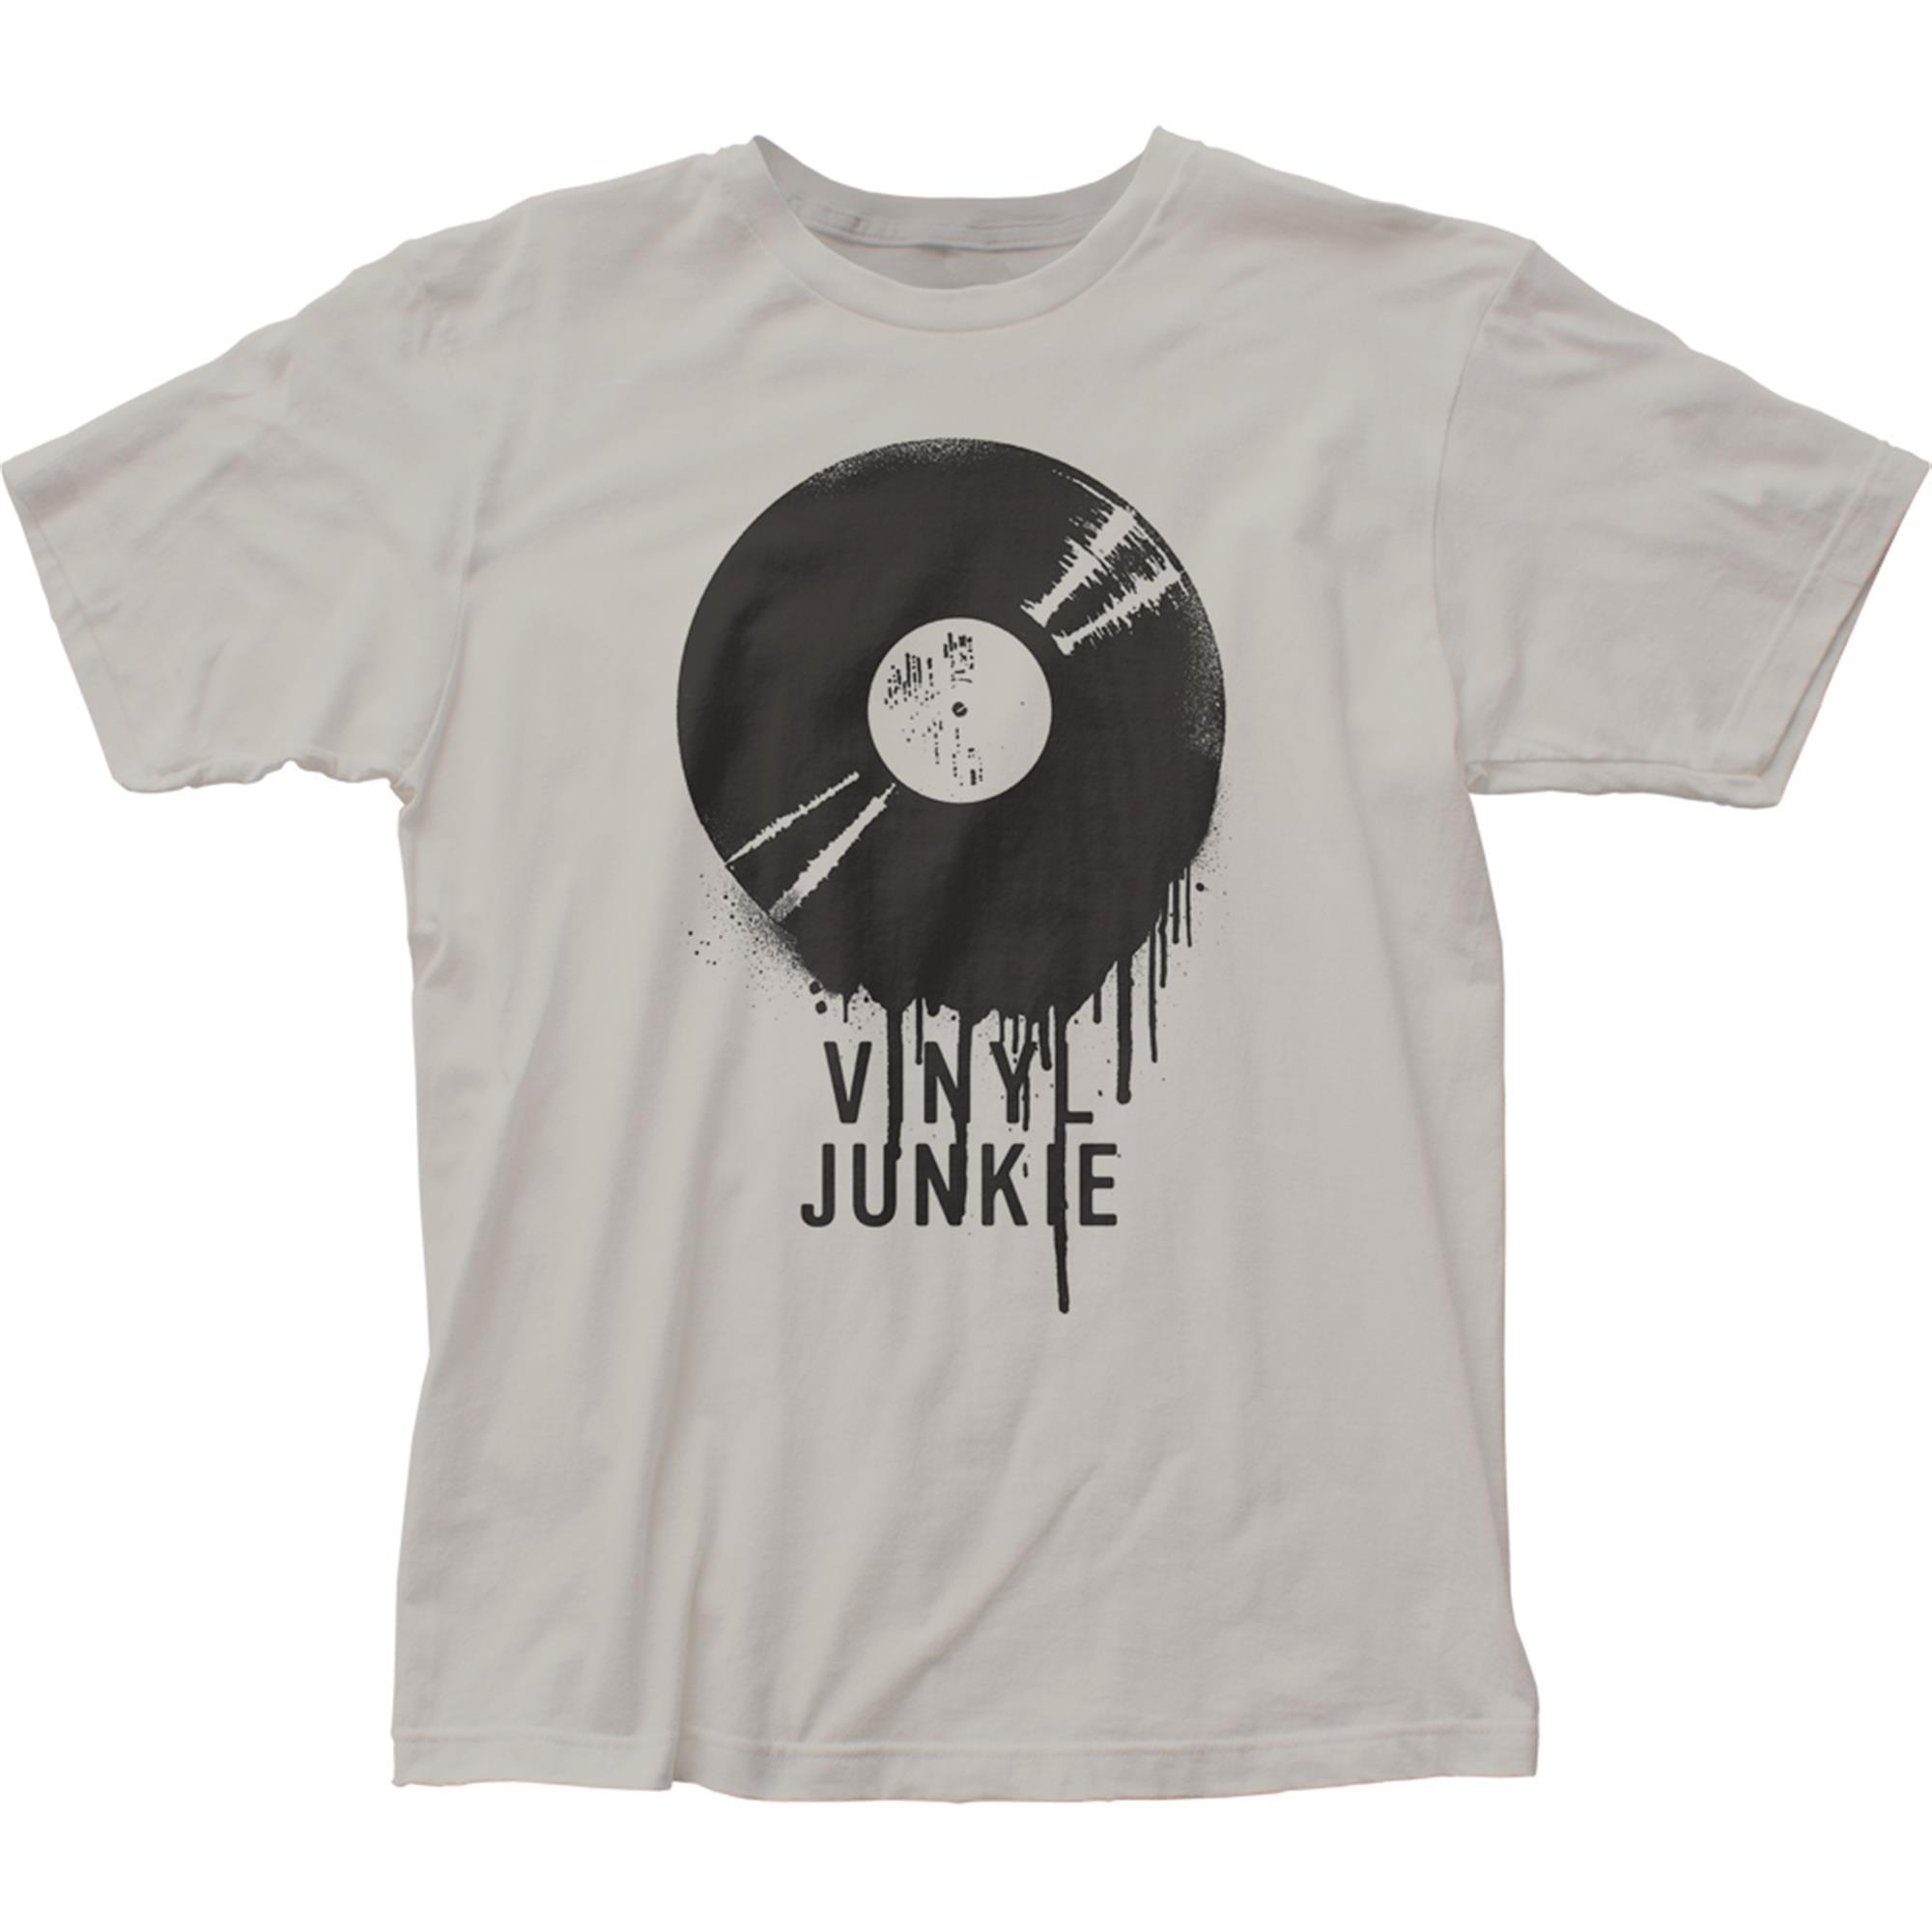 Impact Originals Vinyl Junkie T-Shirt